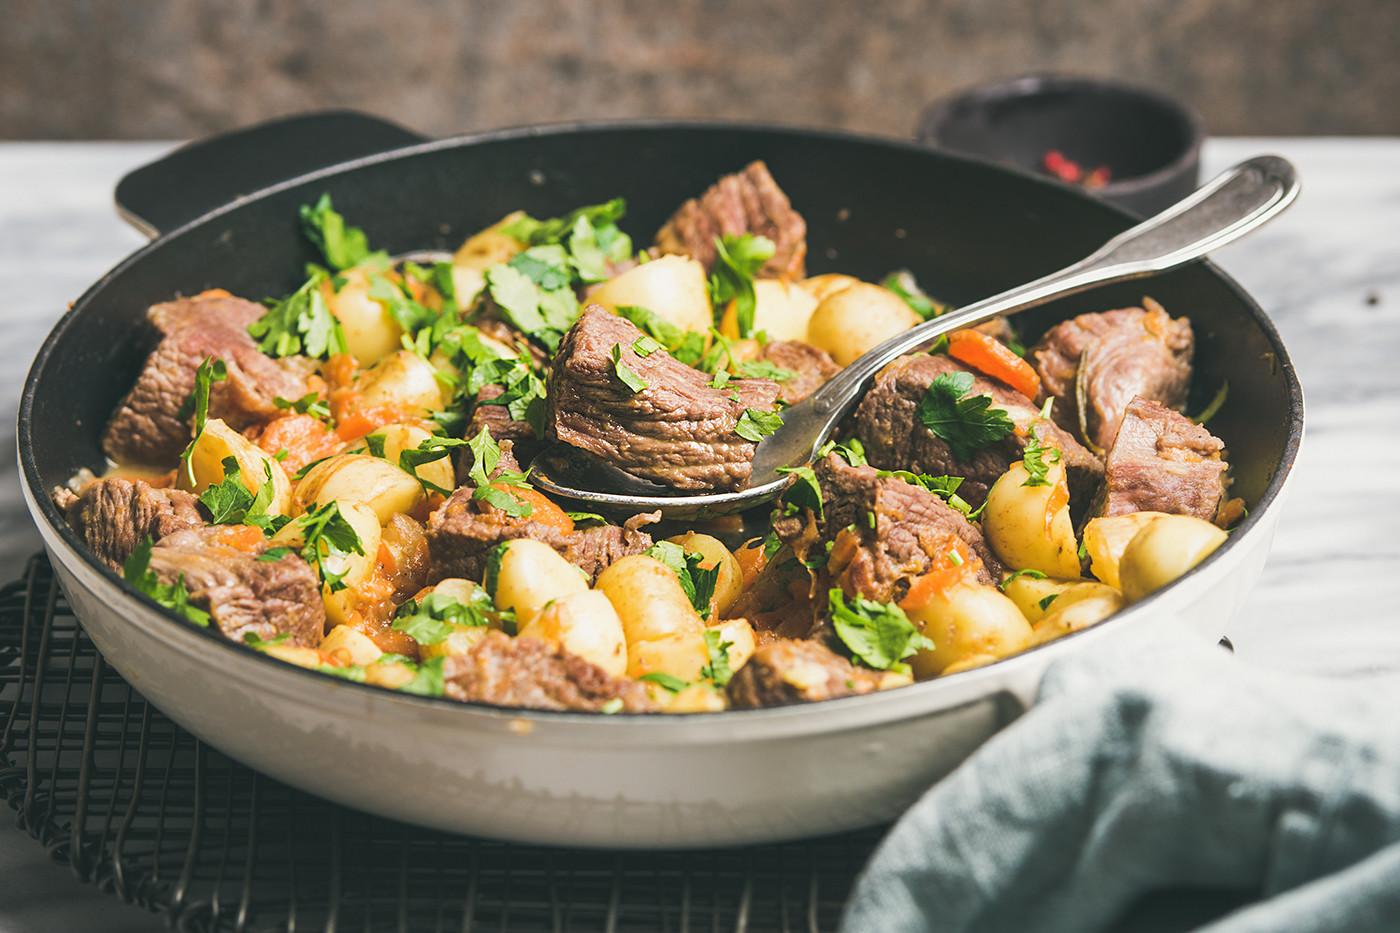 Braised beef meat stew with fresh parsley in pan